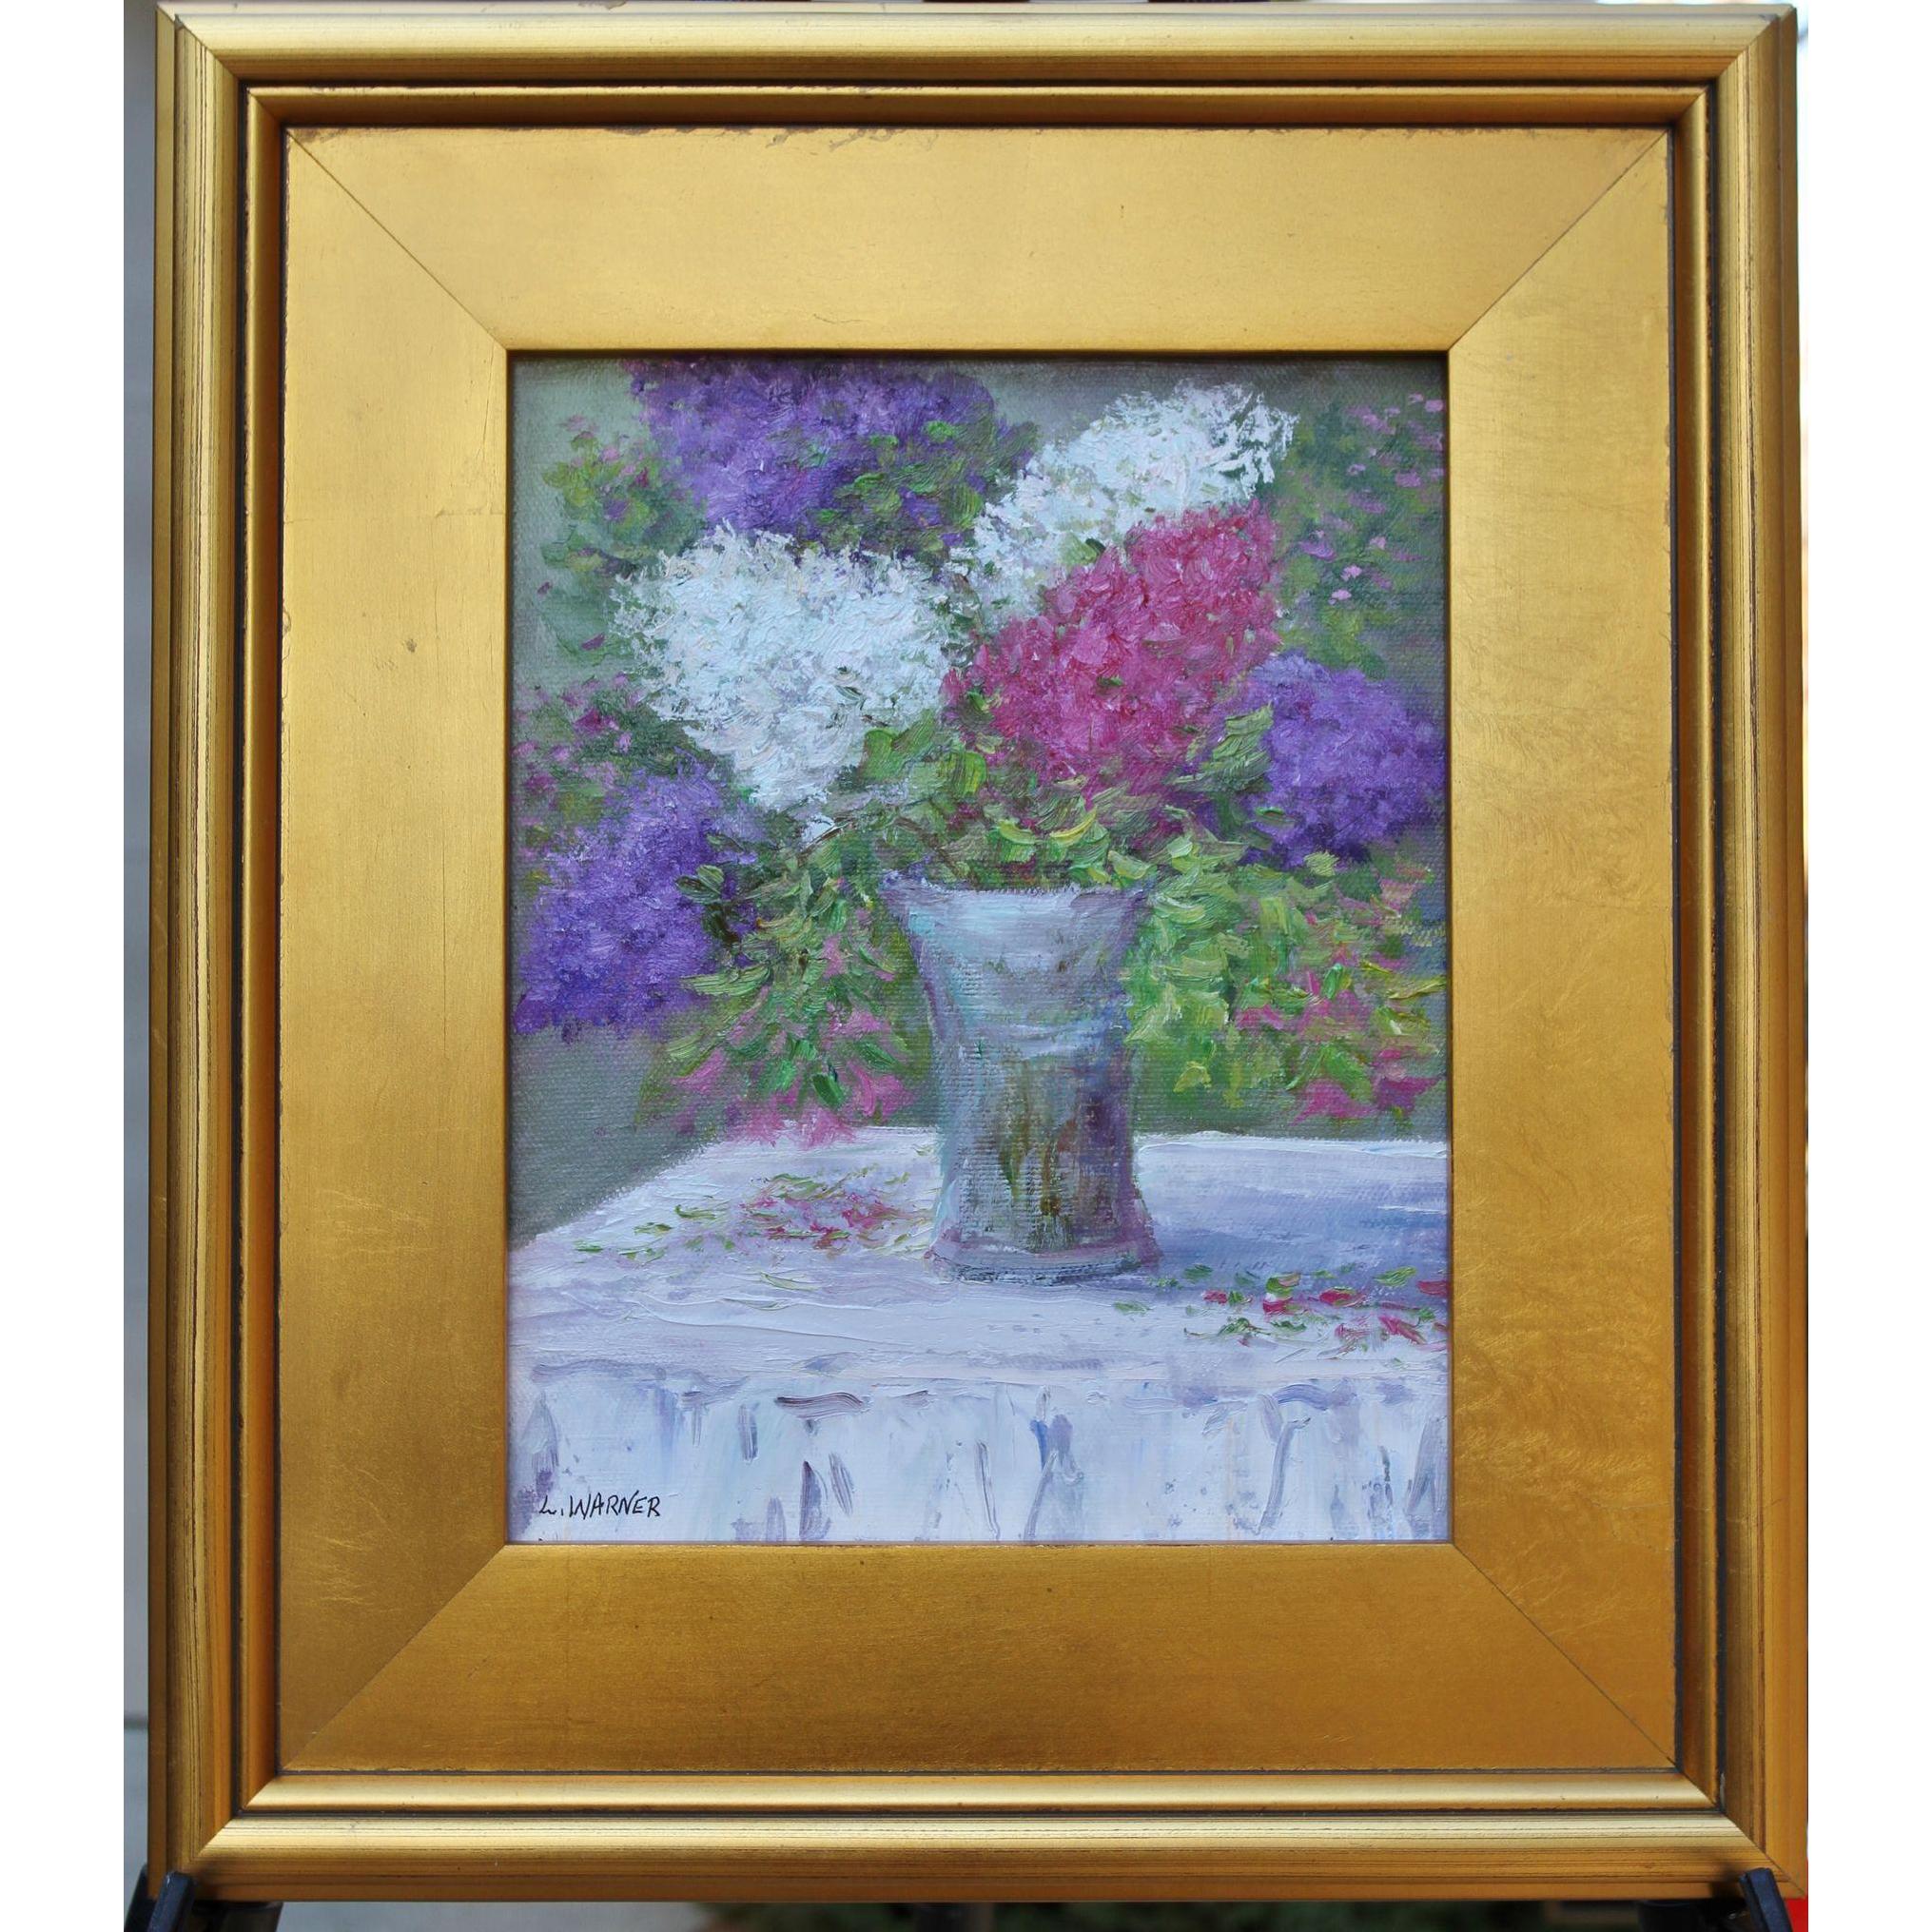 Lilac Bouquet 8 X 10 Framed Oil Painting Artist L Warner Pastel Floral Still Life Rubylanecom Finear Framed Oil Painting Artist Painting Painting